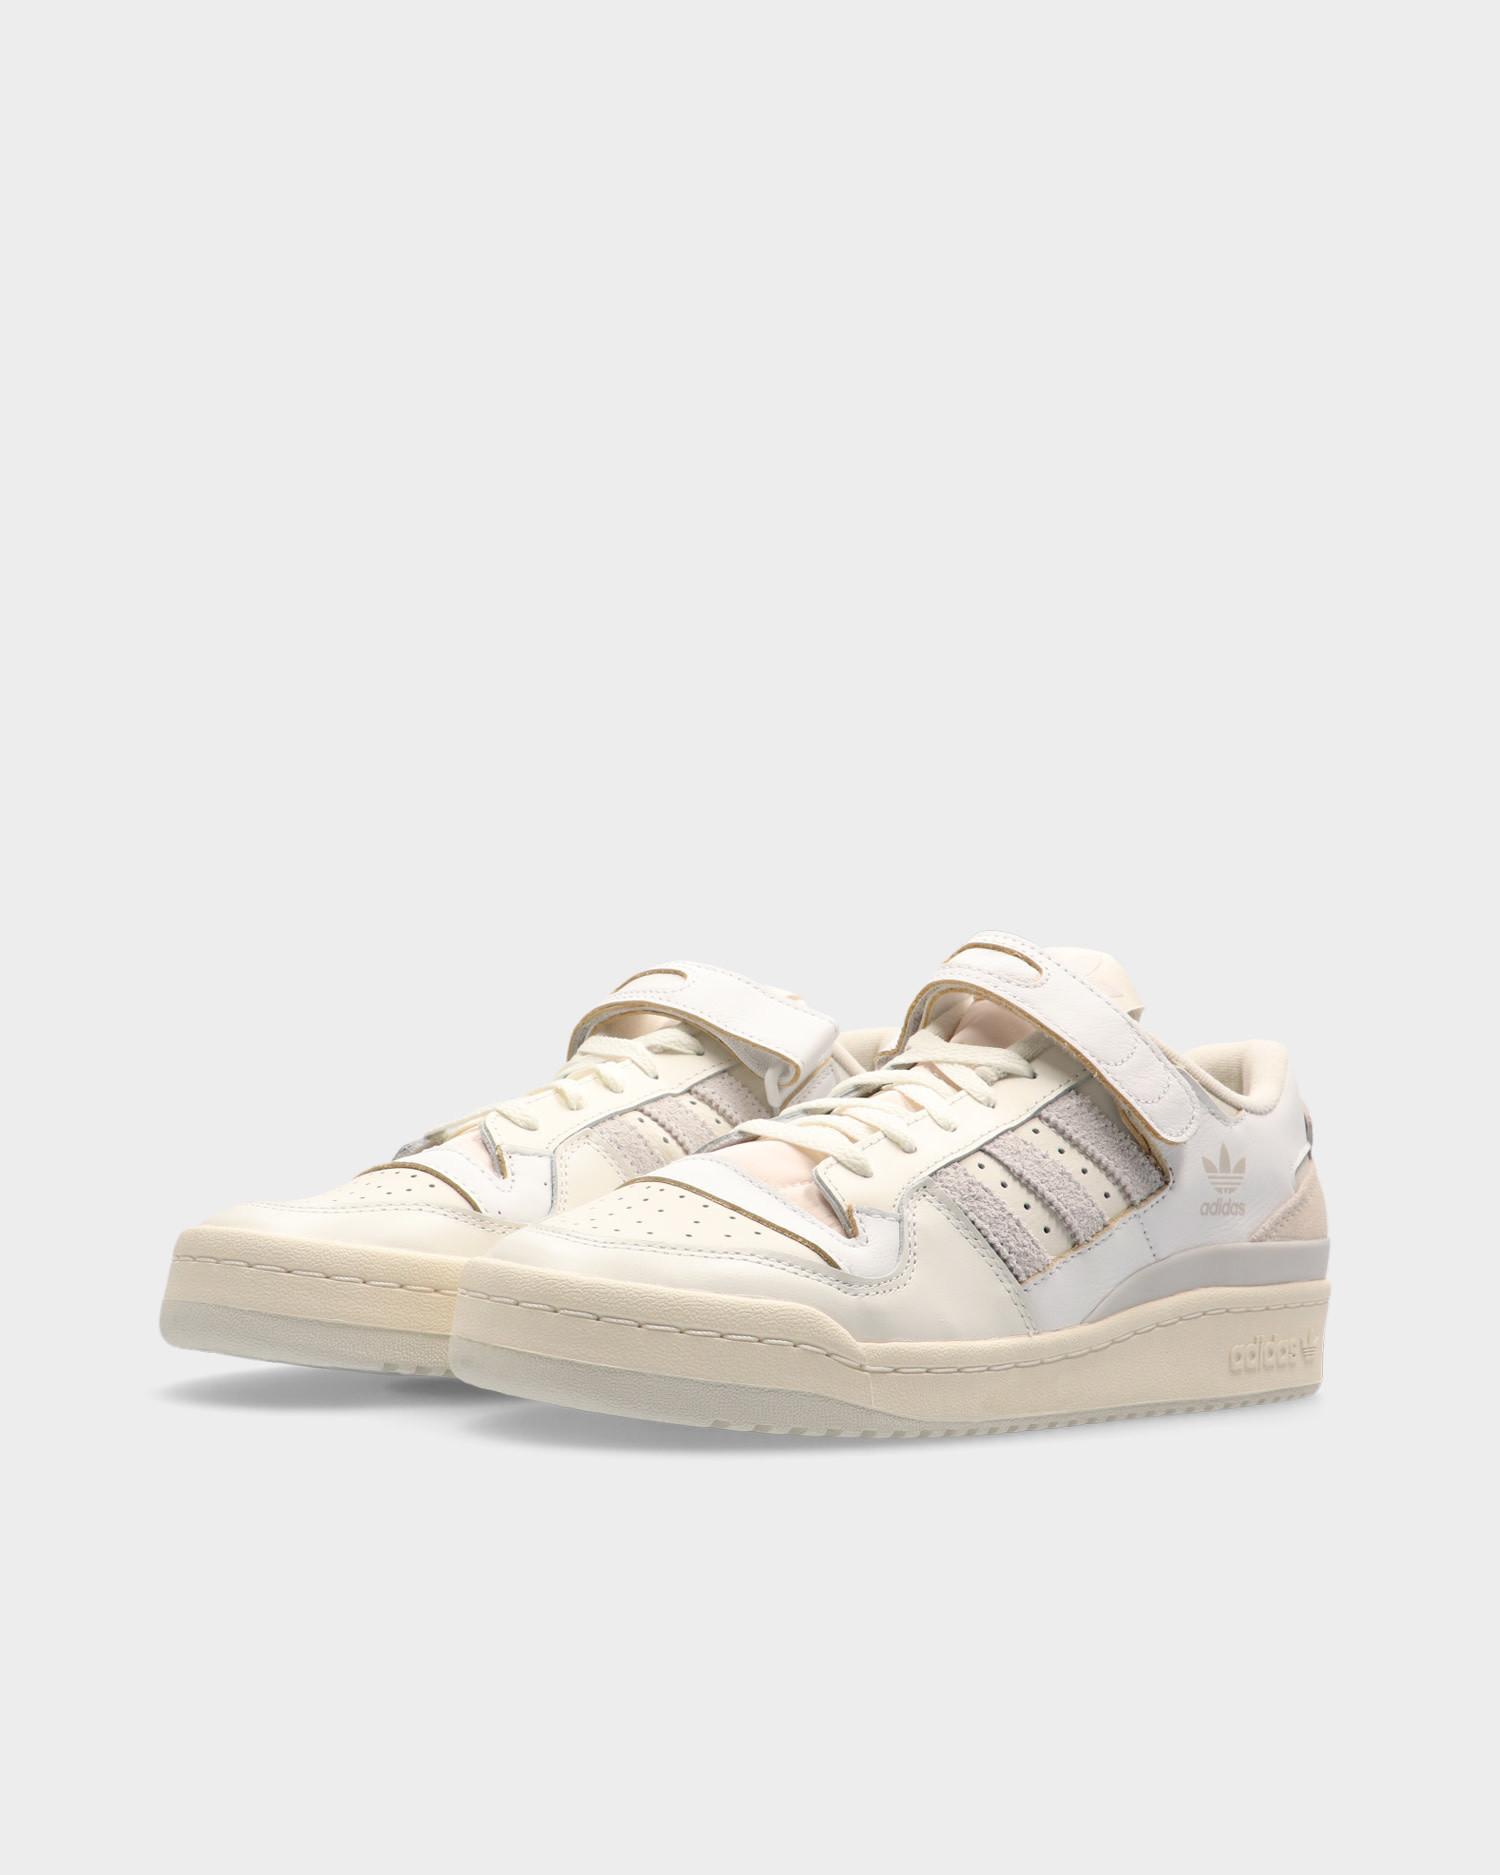 Adidas Forum 84 Low Greone/OrbGry/FtwWht